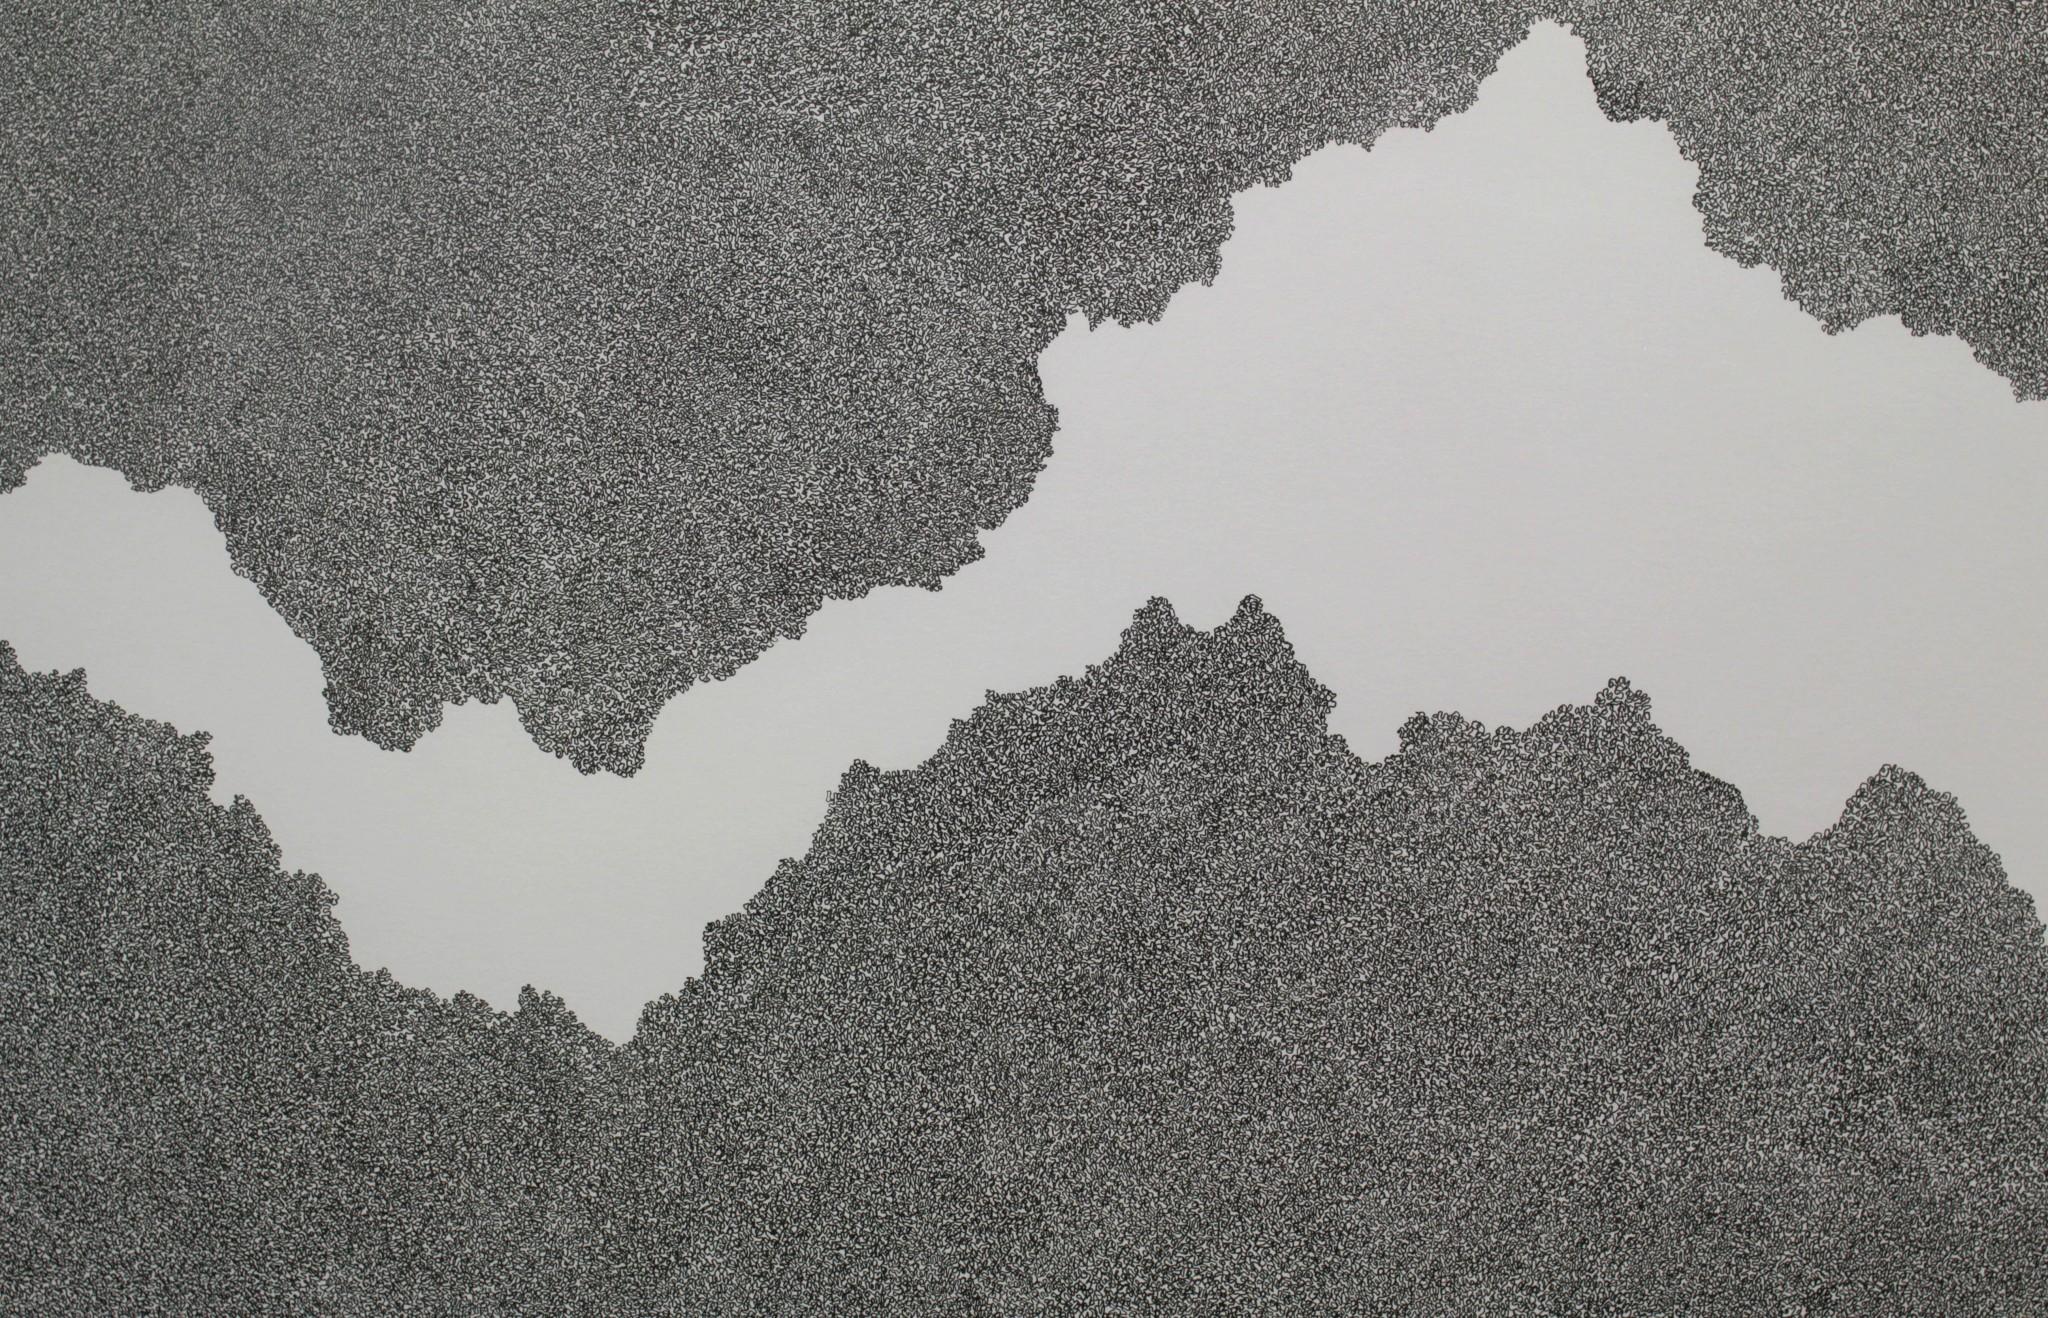 DETALJ-Between-two-lines-svart-75x110cm-2018-Material-Tusch-på-papperdetalj